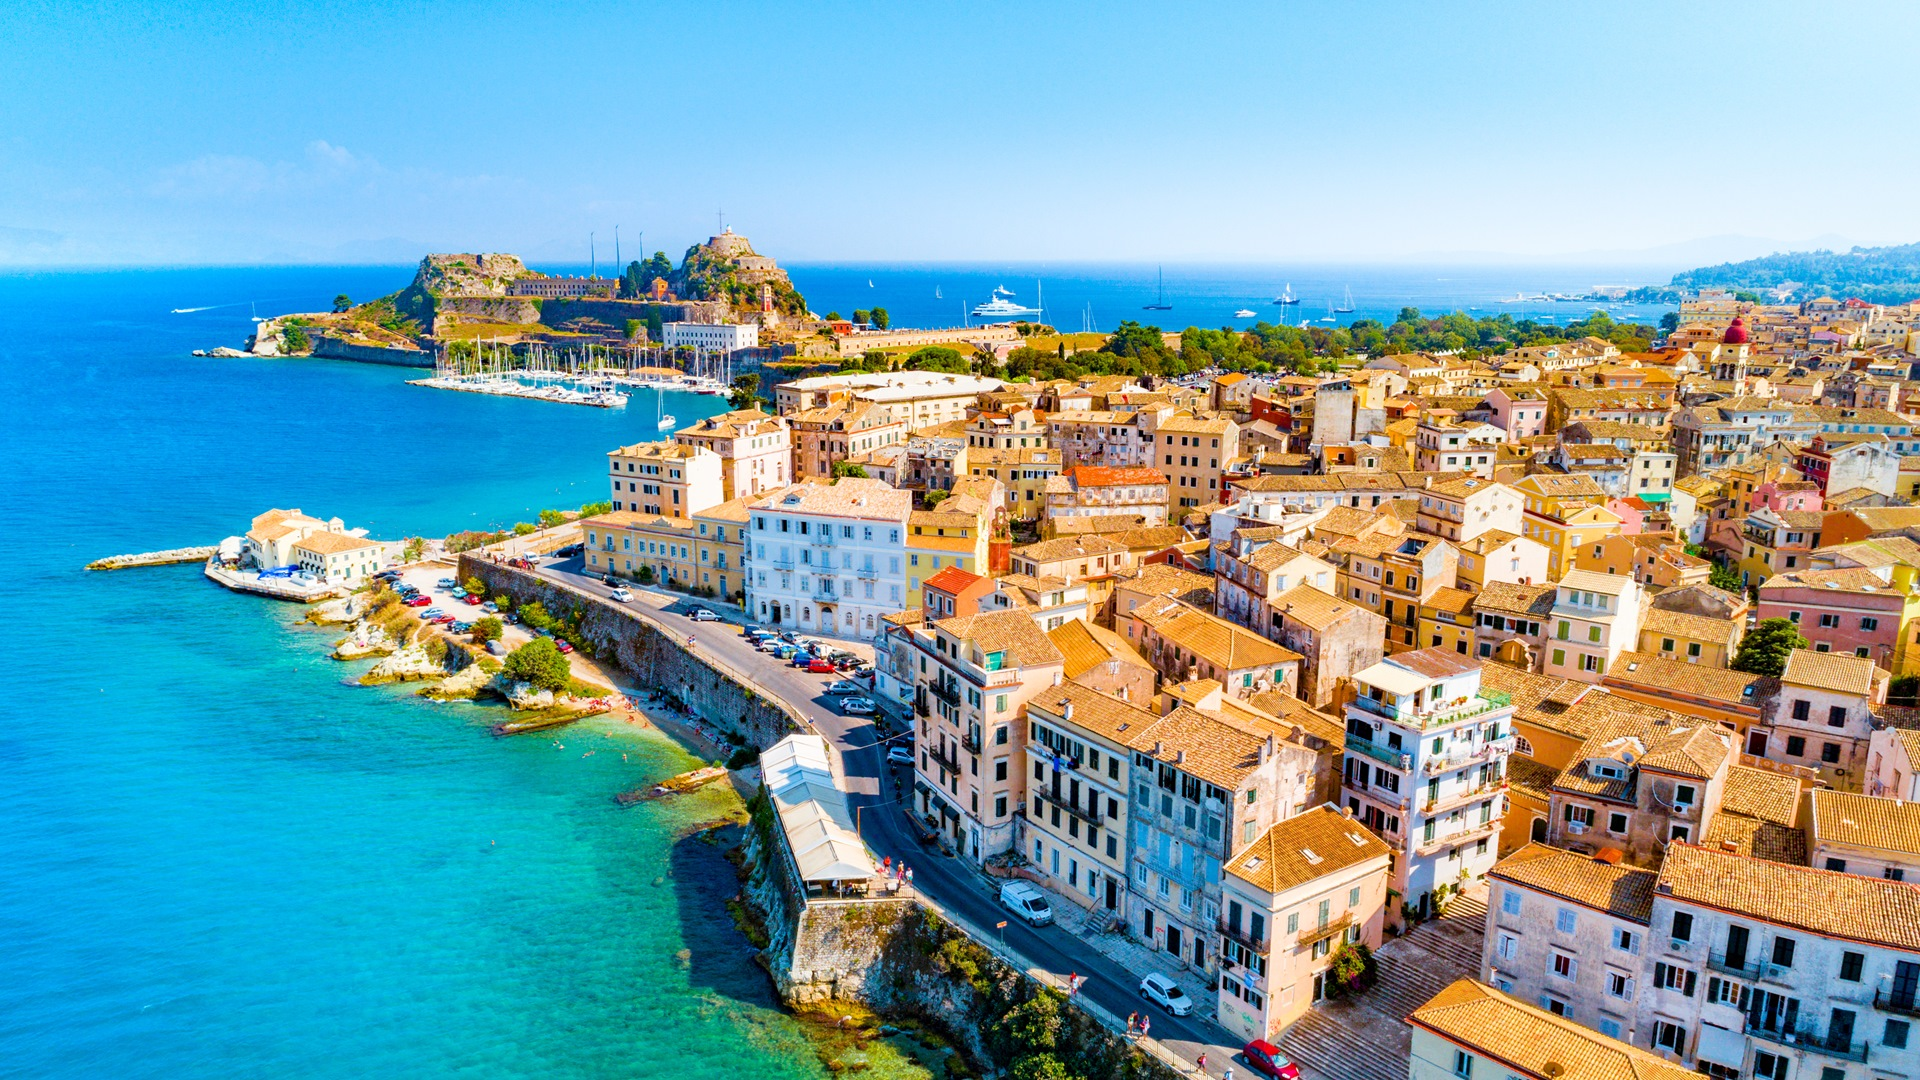 Explore the town of Corfu